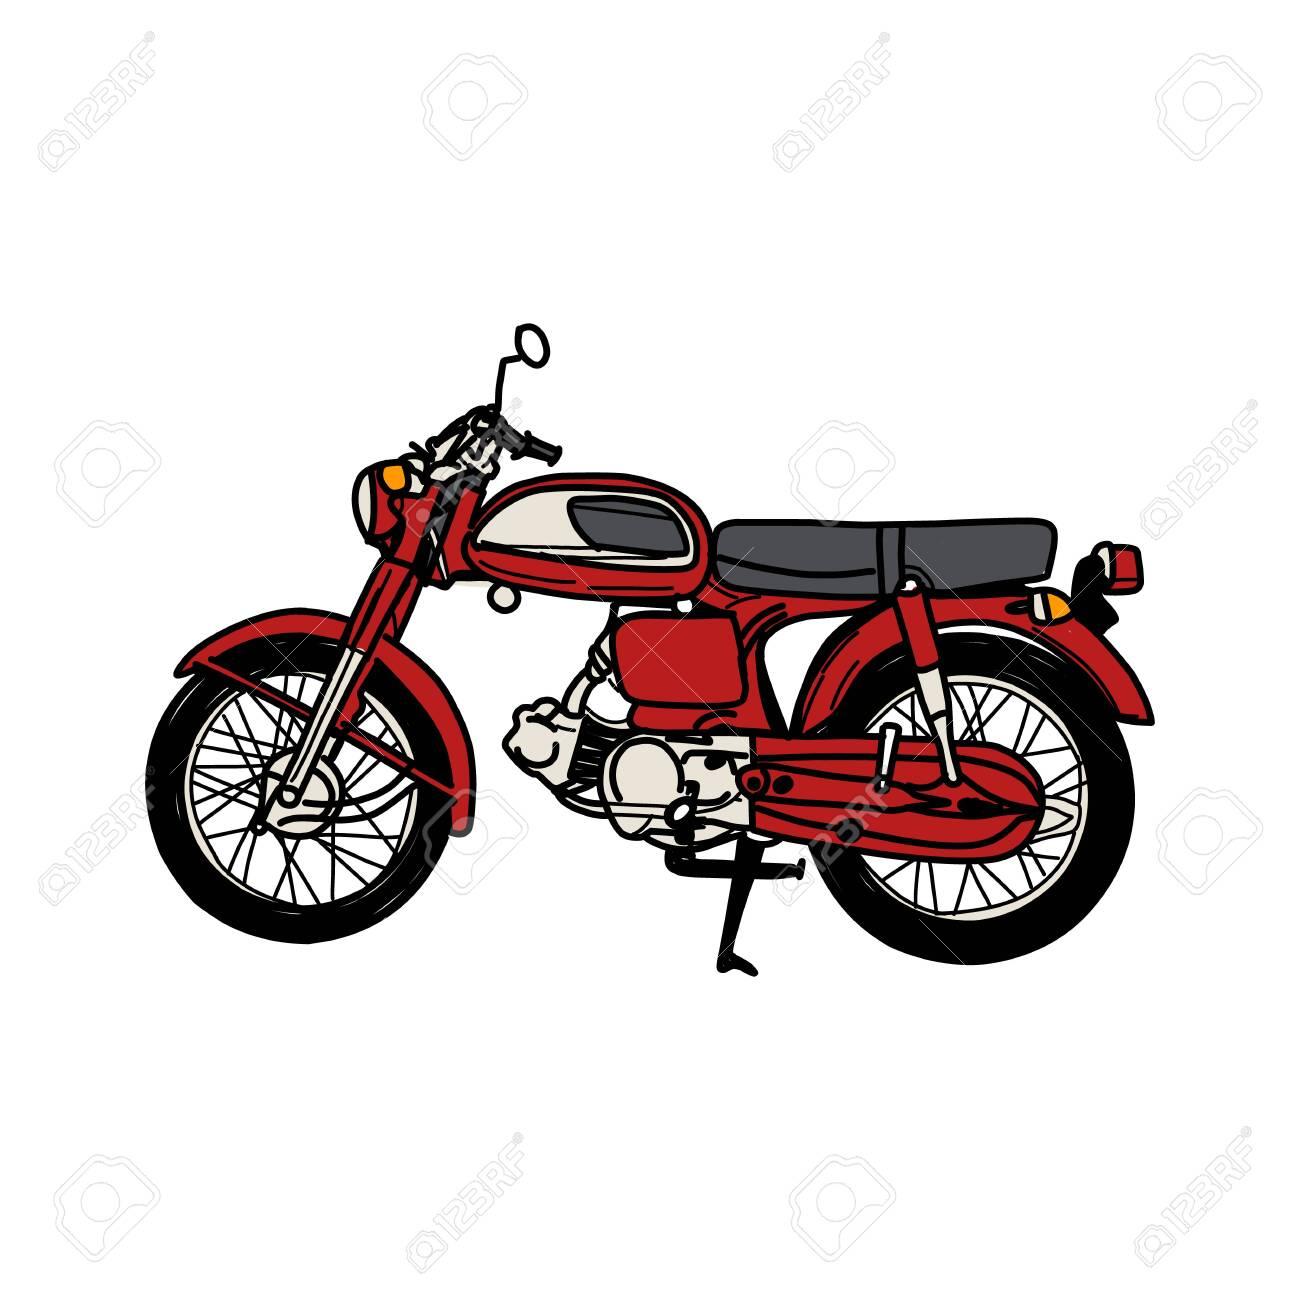 Silhouette of Old Motorcycle - vintage motorcycle - 130210854